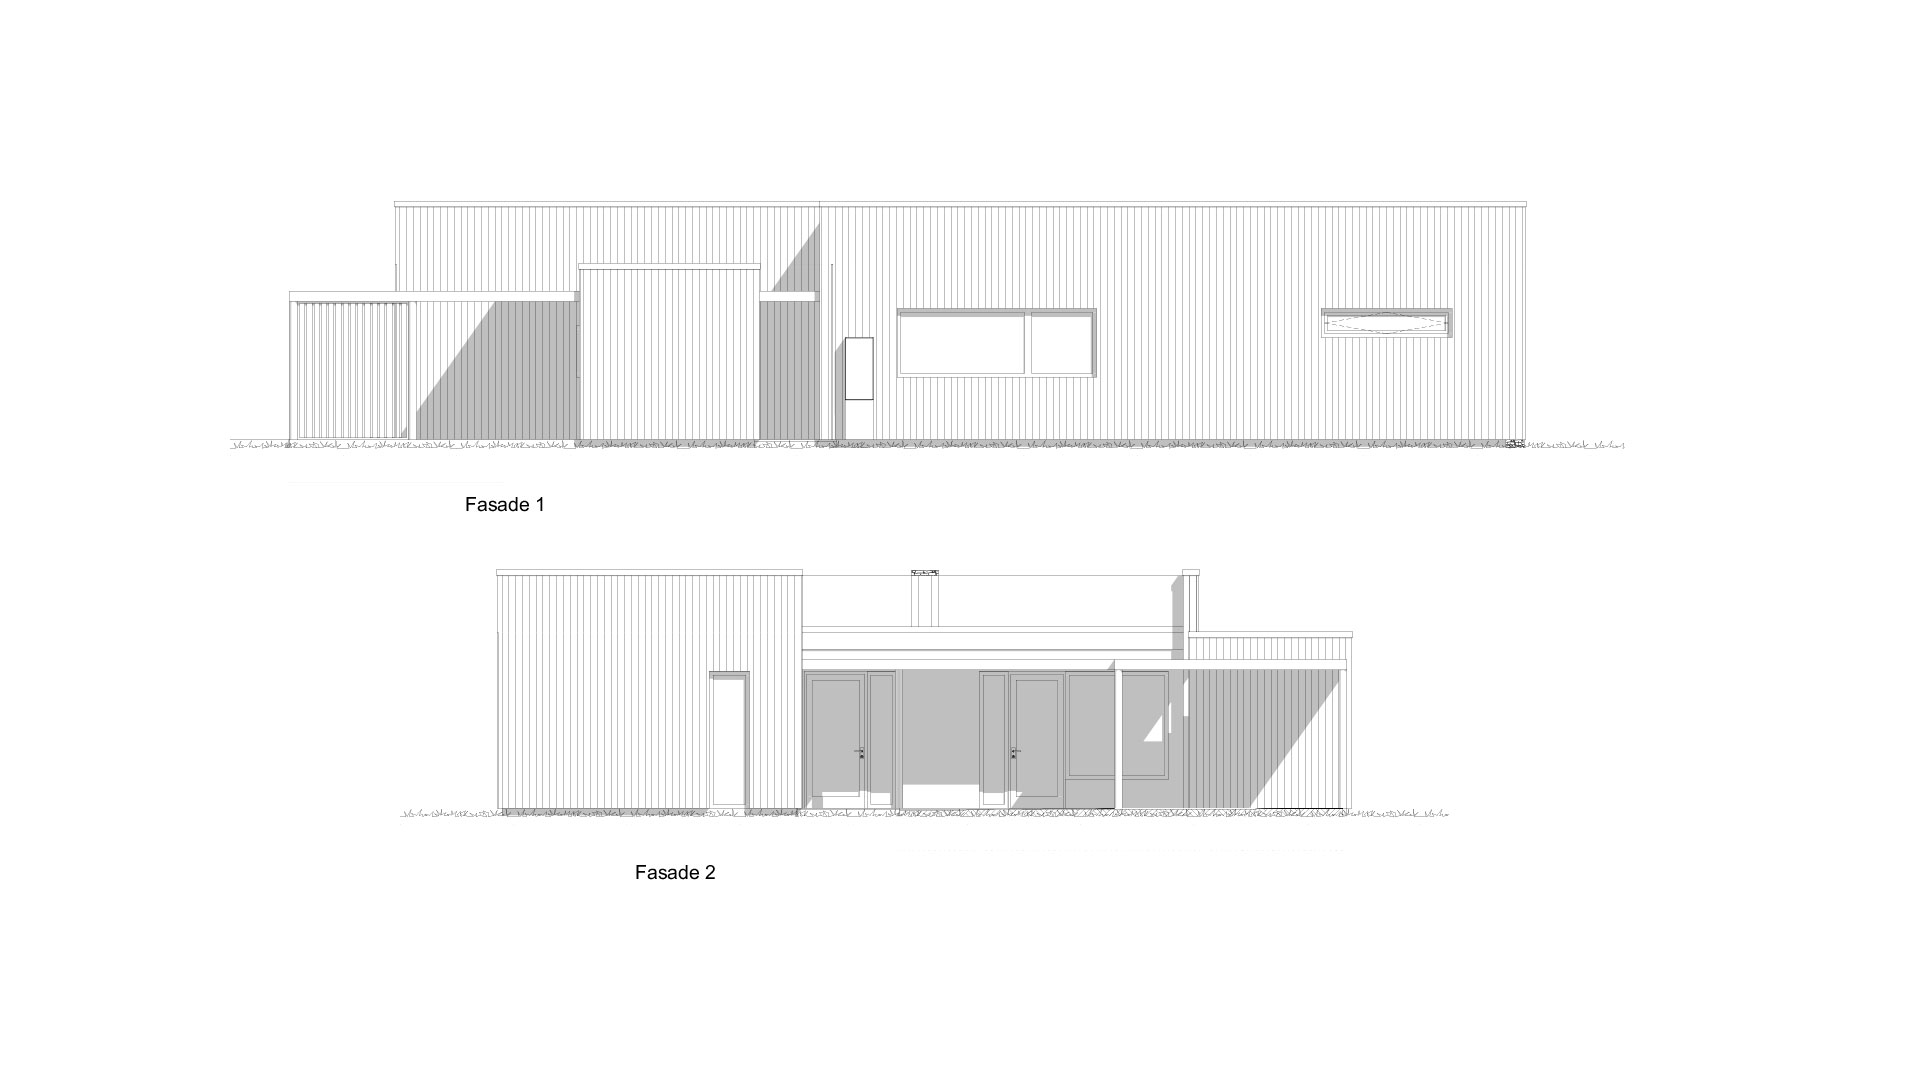 Oasen_Fasade1-2.jpg